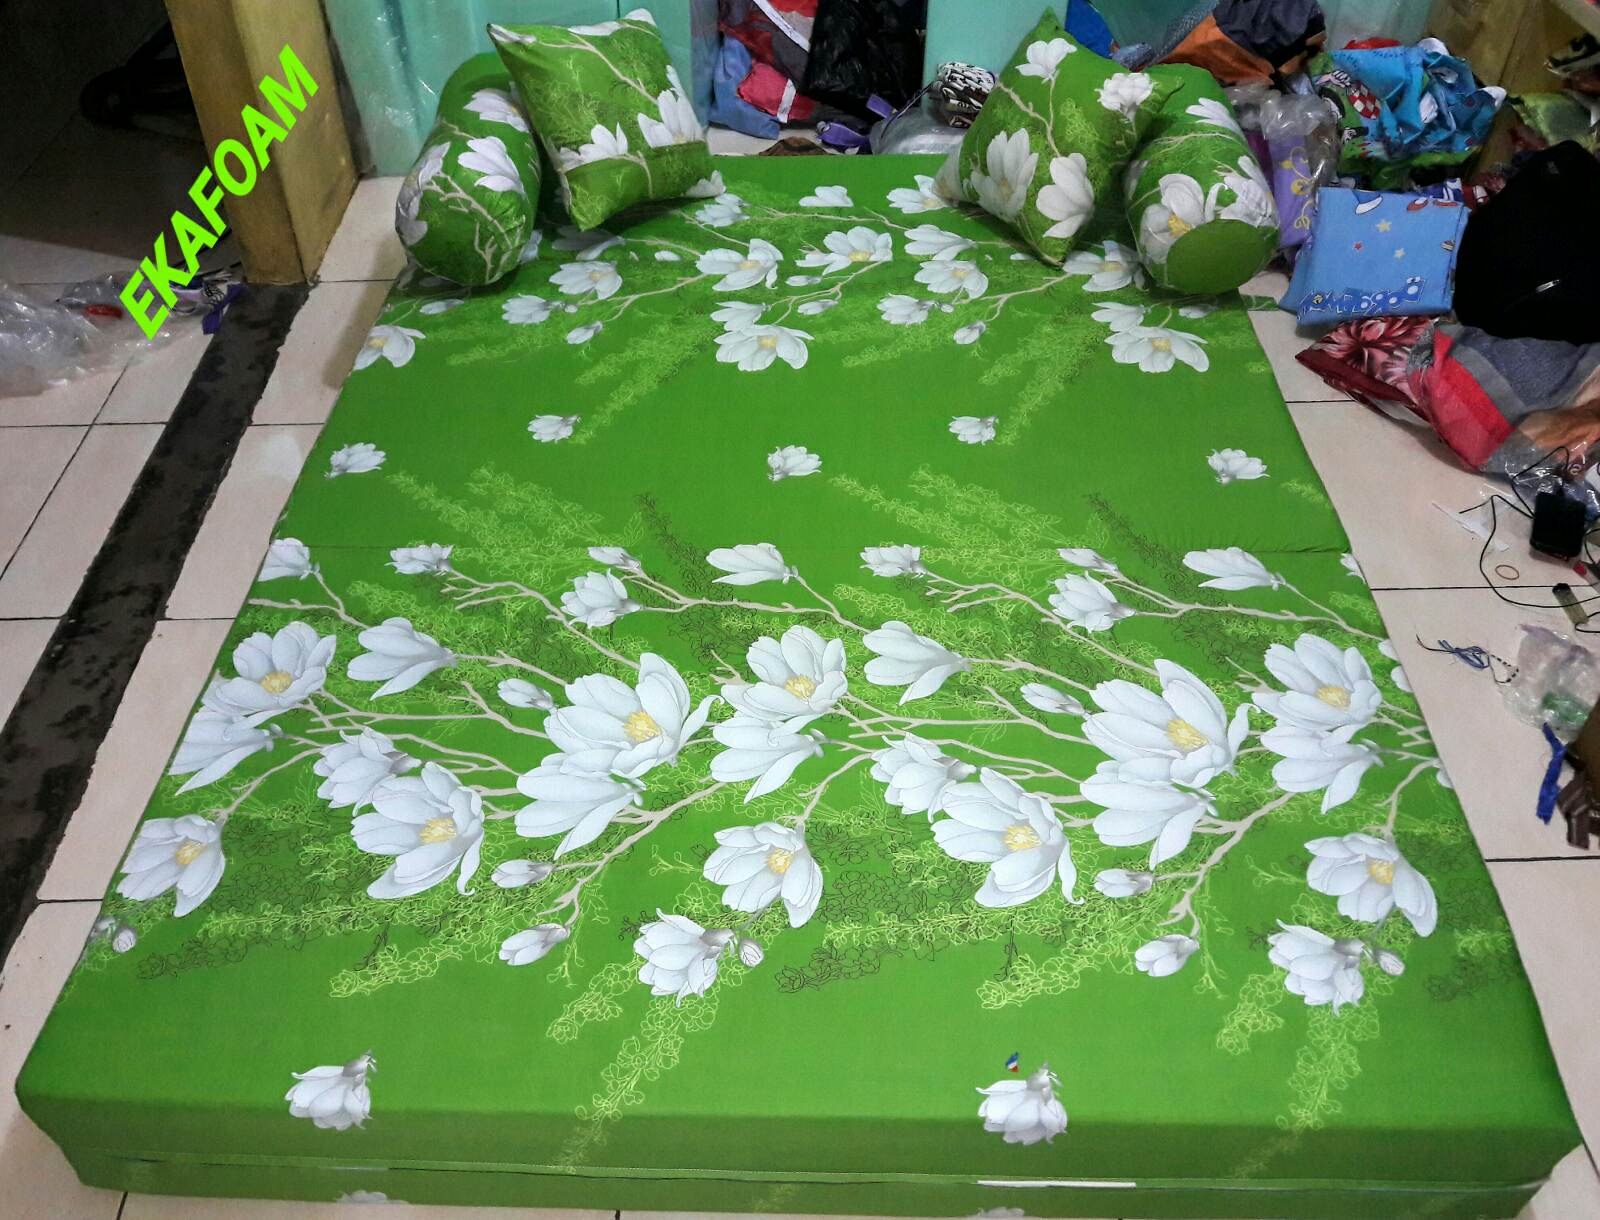 Sofa Bed Inoac 3 In 1 Cushions On Brown Leather 2017 Full Motif Agen Resmi Kasur Busa